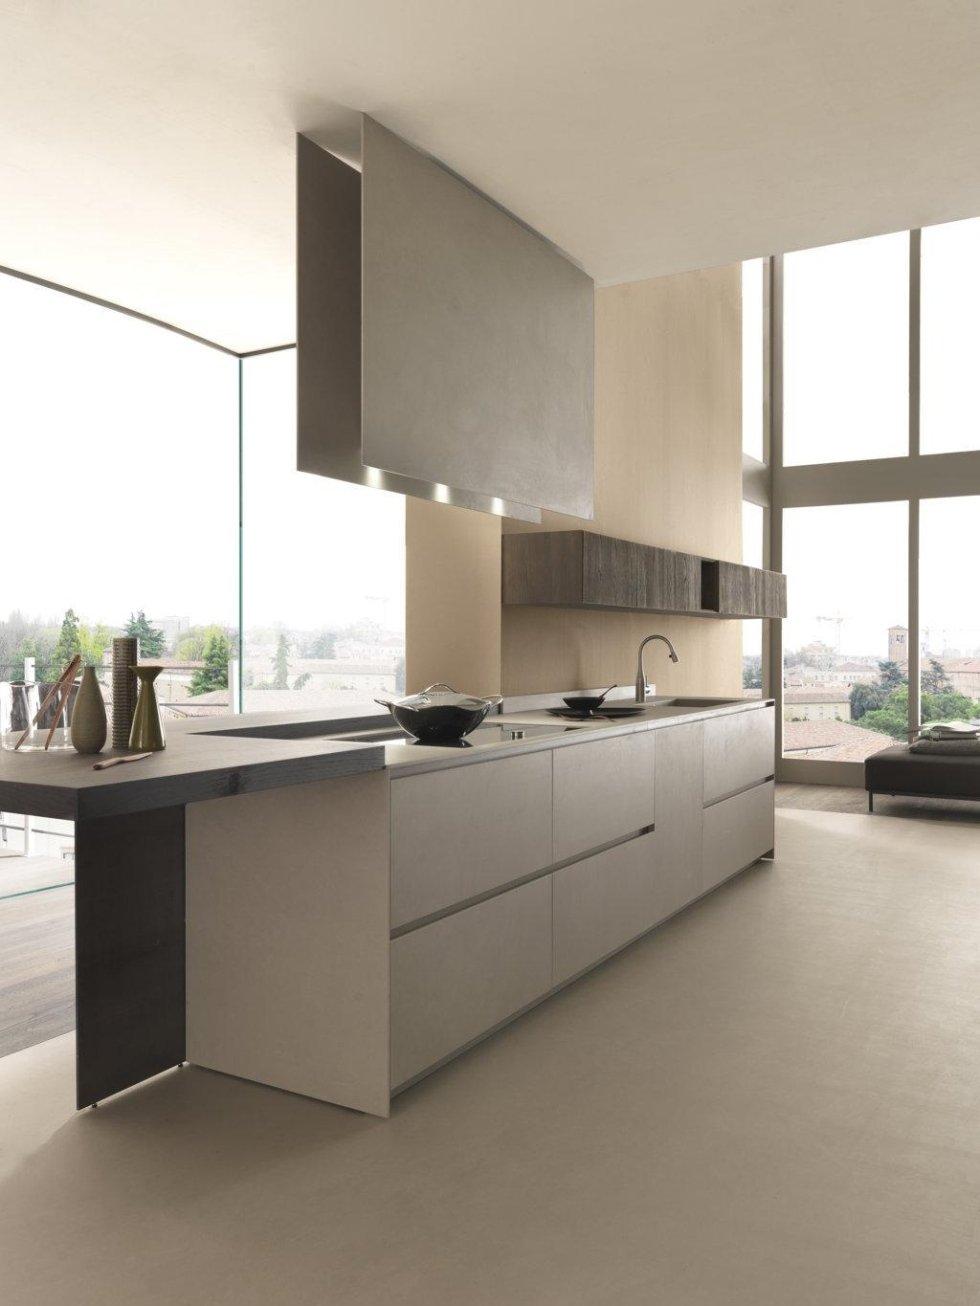 vista laterale di una bancone di cucina moderna con infissi